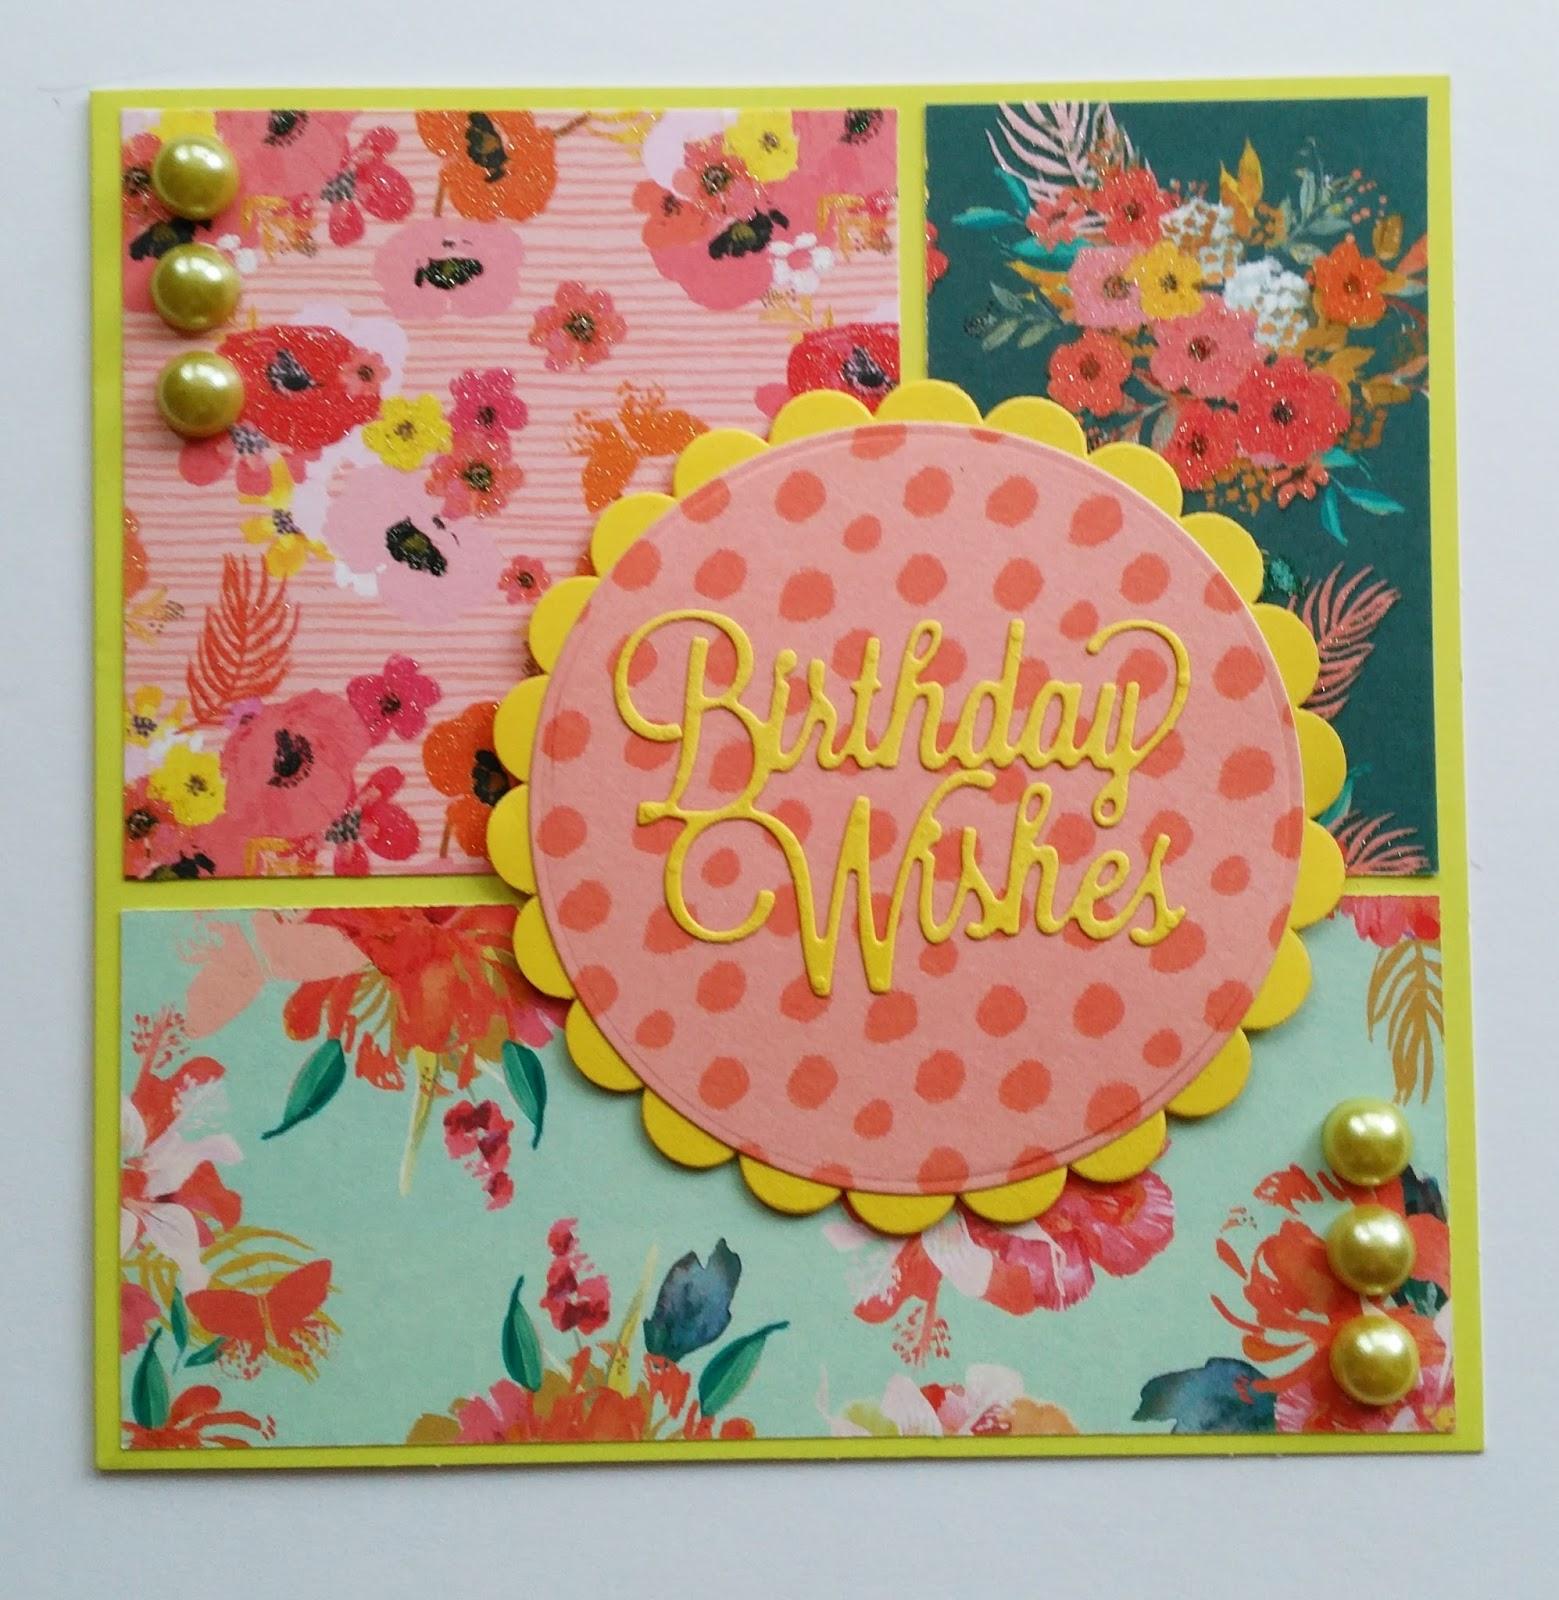 Icedimages Simple Paradise Crush Birthday Card